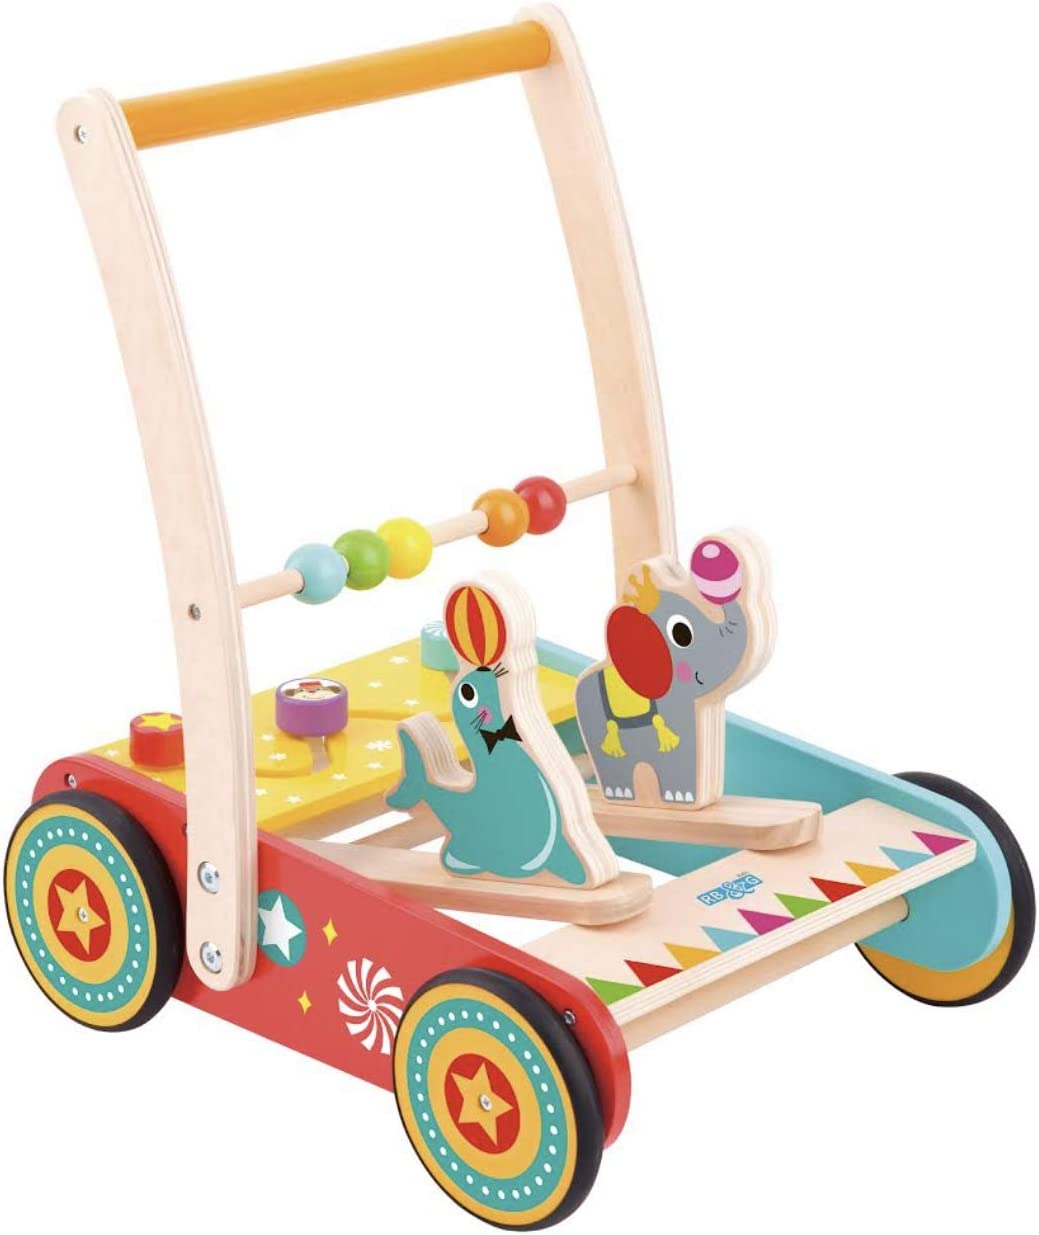 Carrito de madera con ruedas de goma para niños